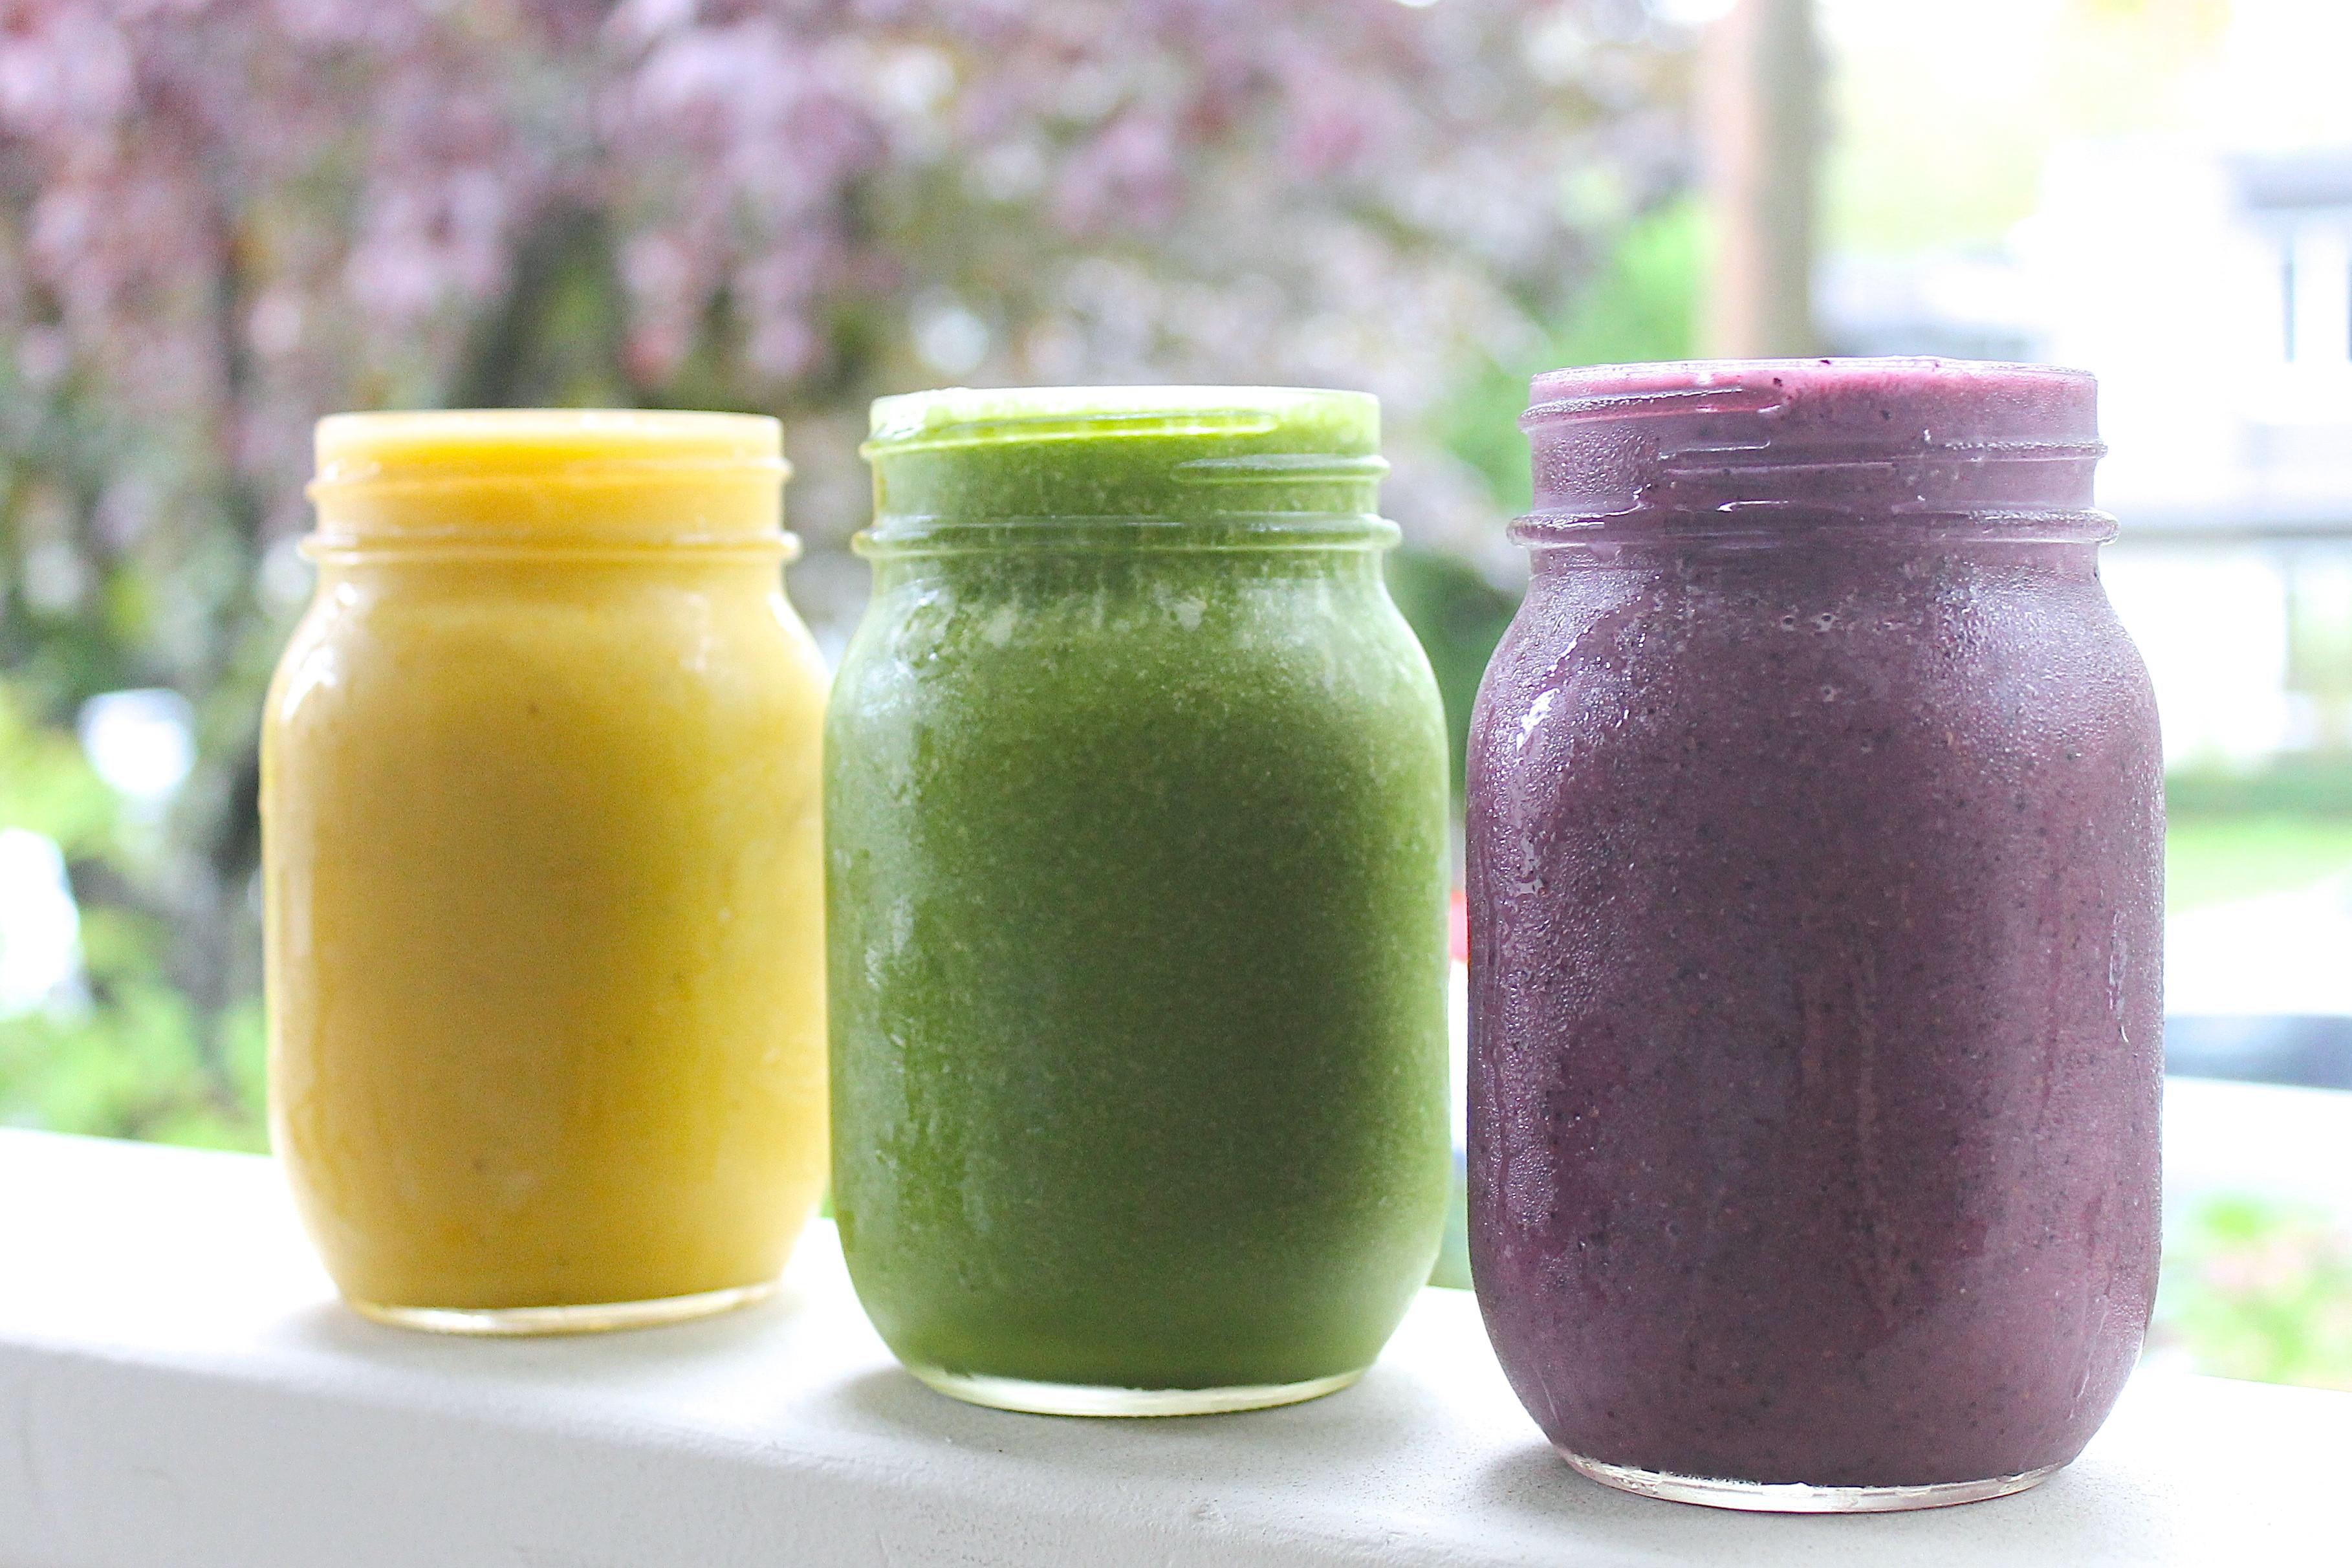 Healthy And Delicious Smoothies  3 Healthy Easy and Delicious Smoothie Recipes for the